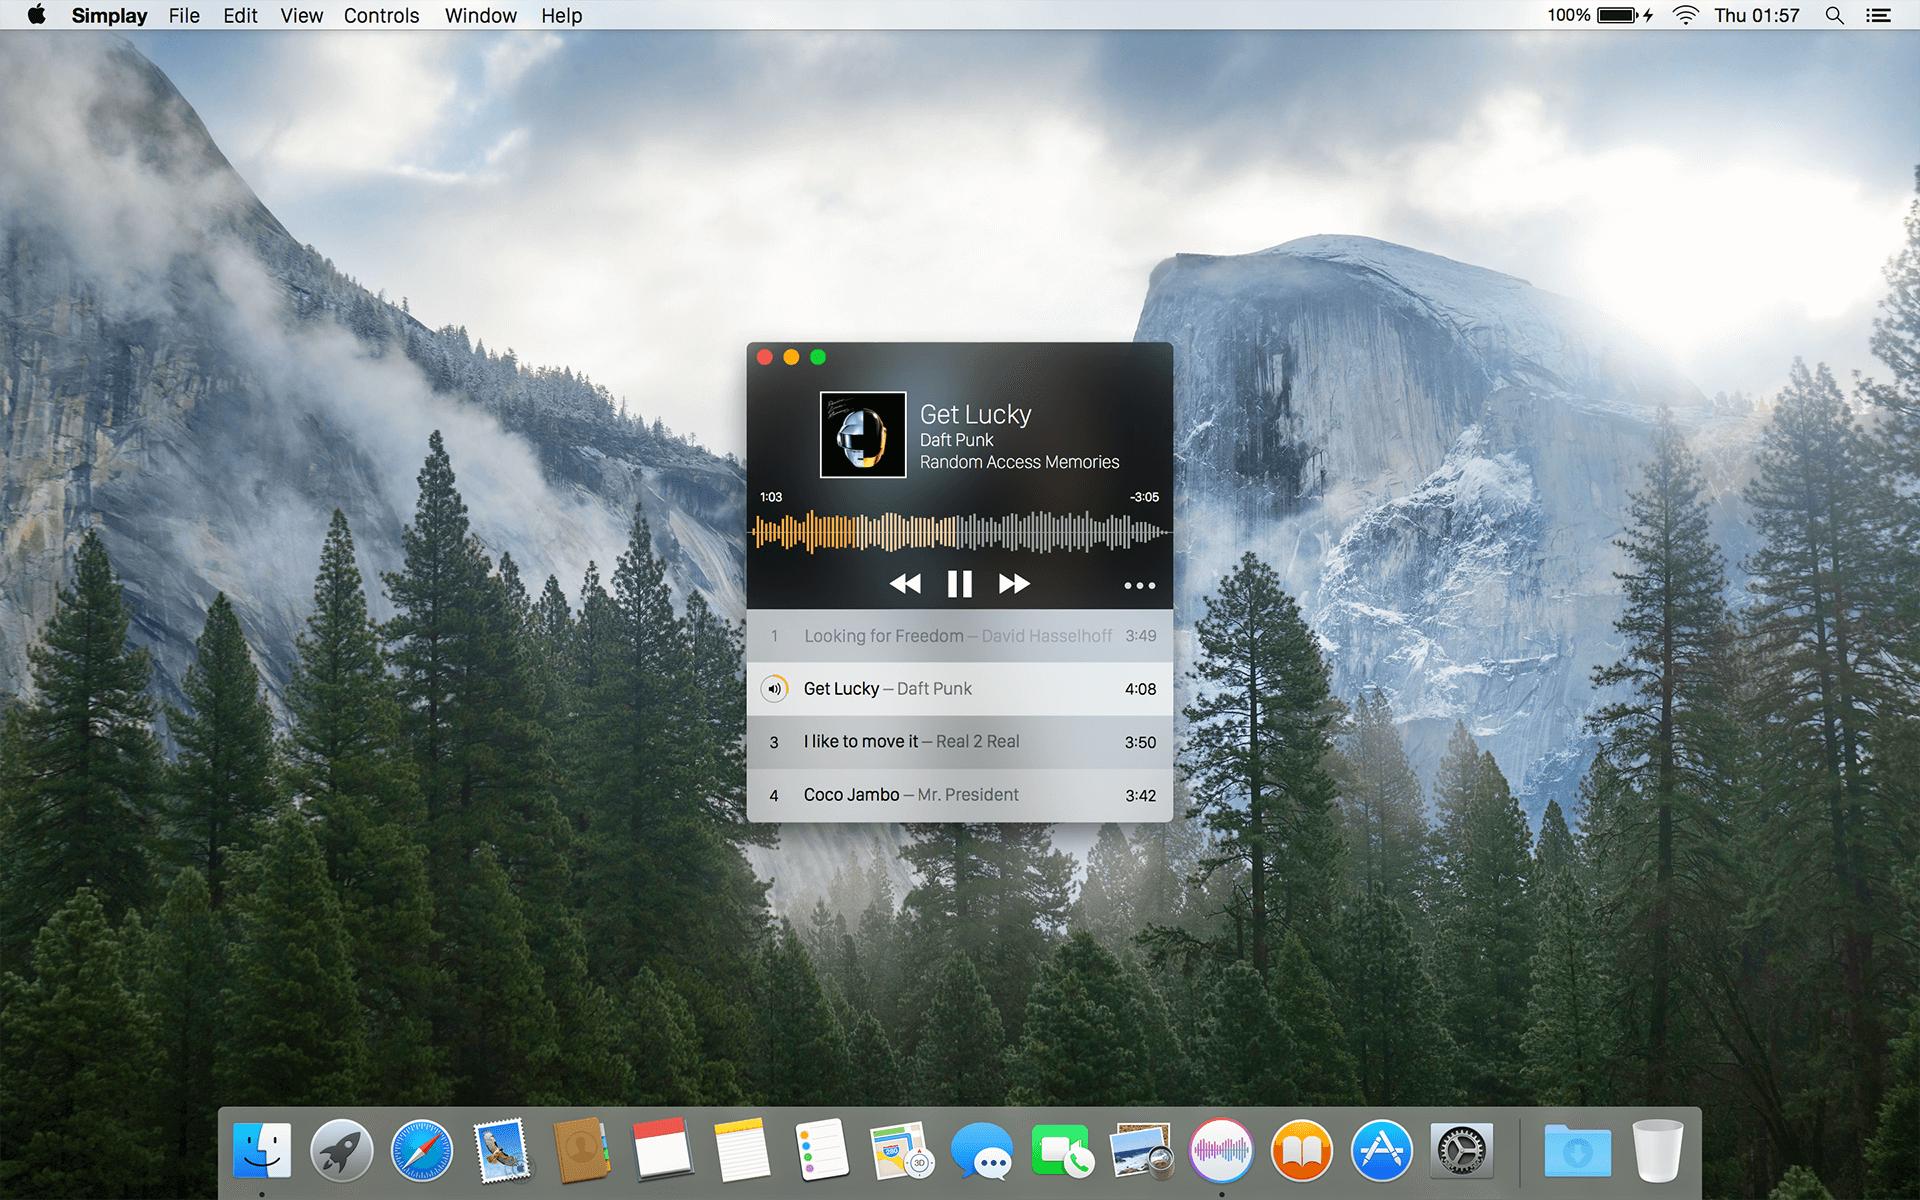 iTunes - Simplay